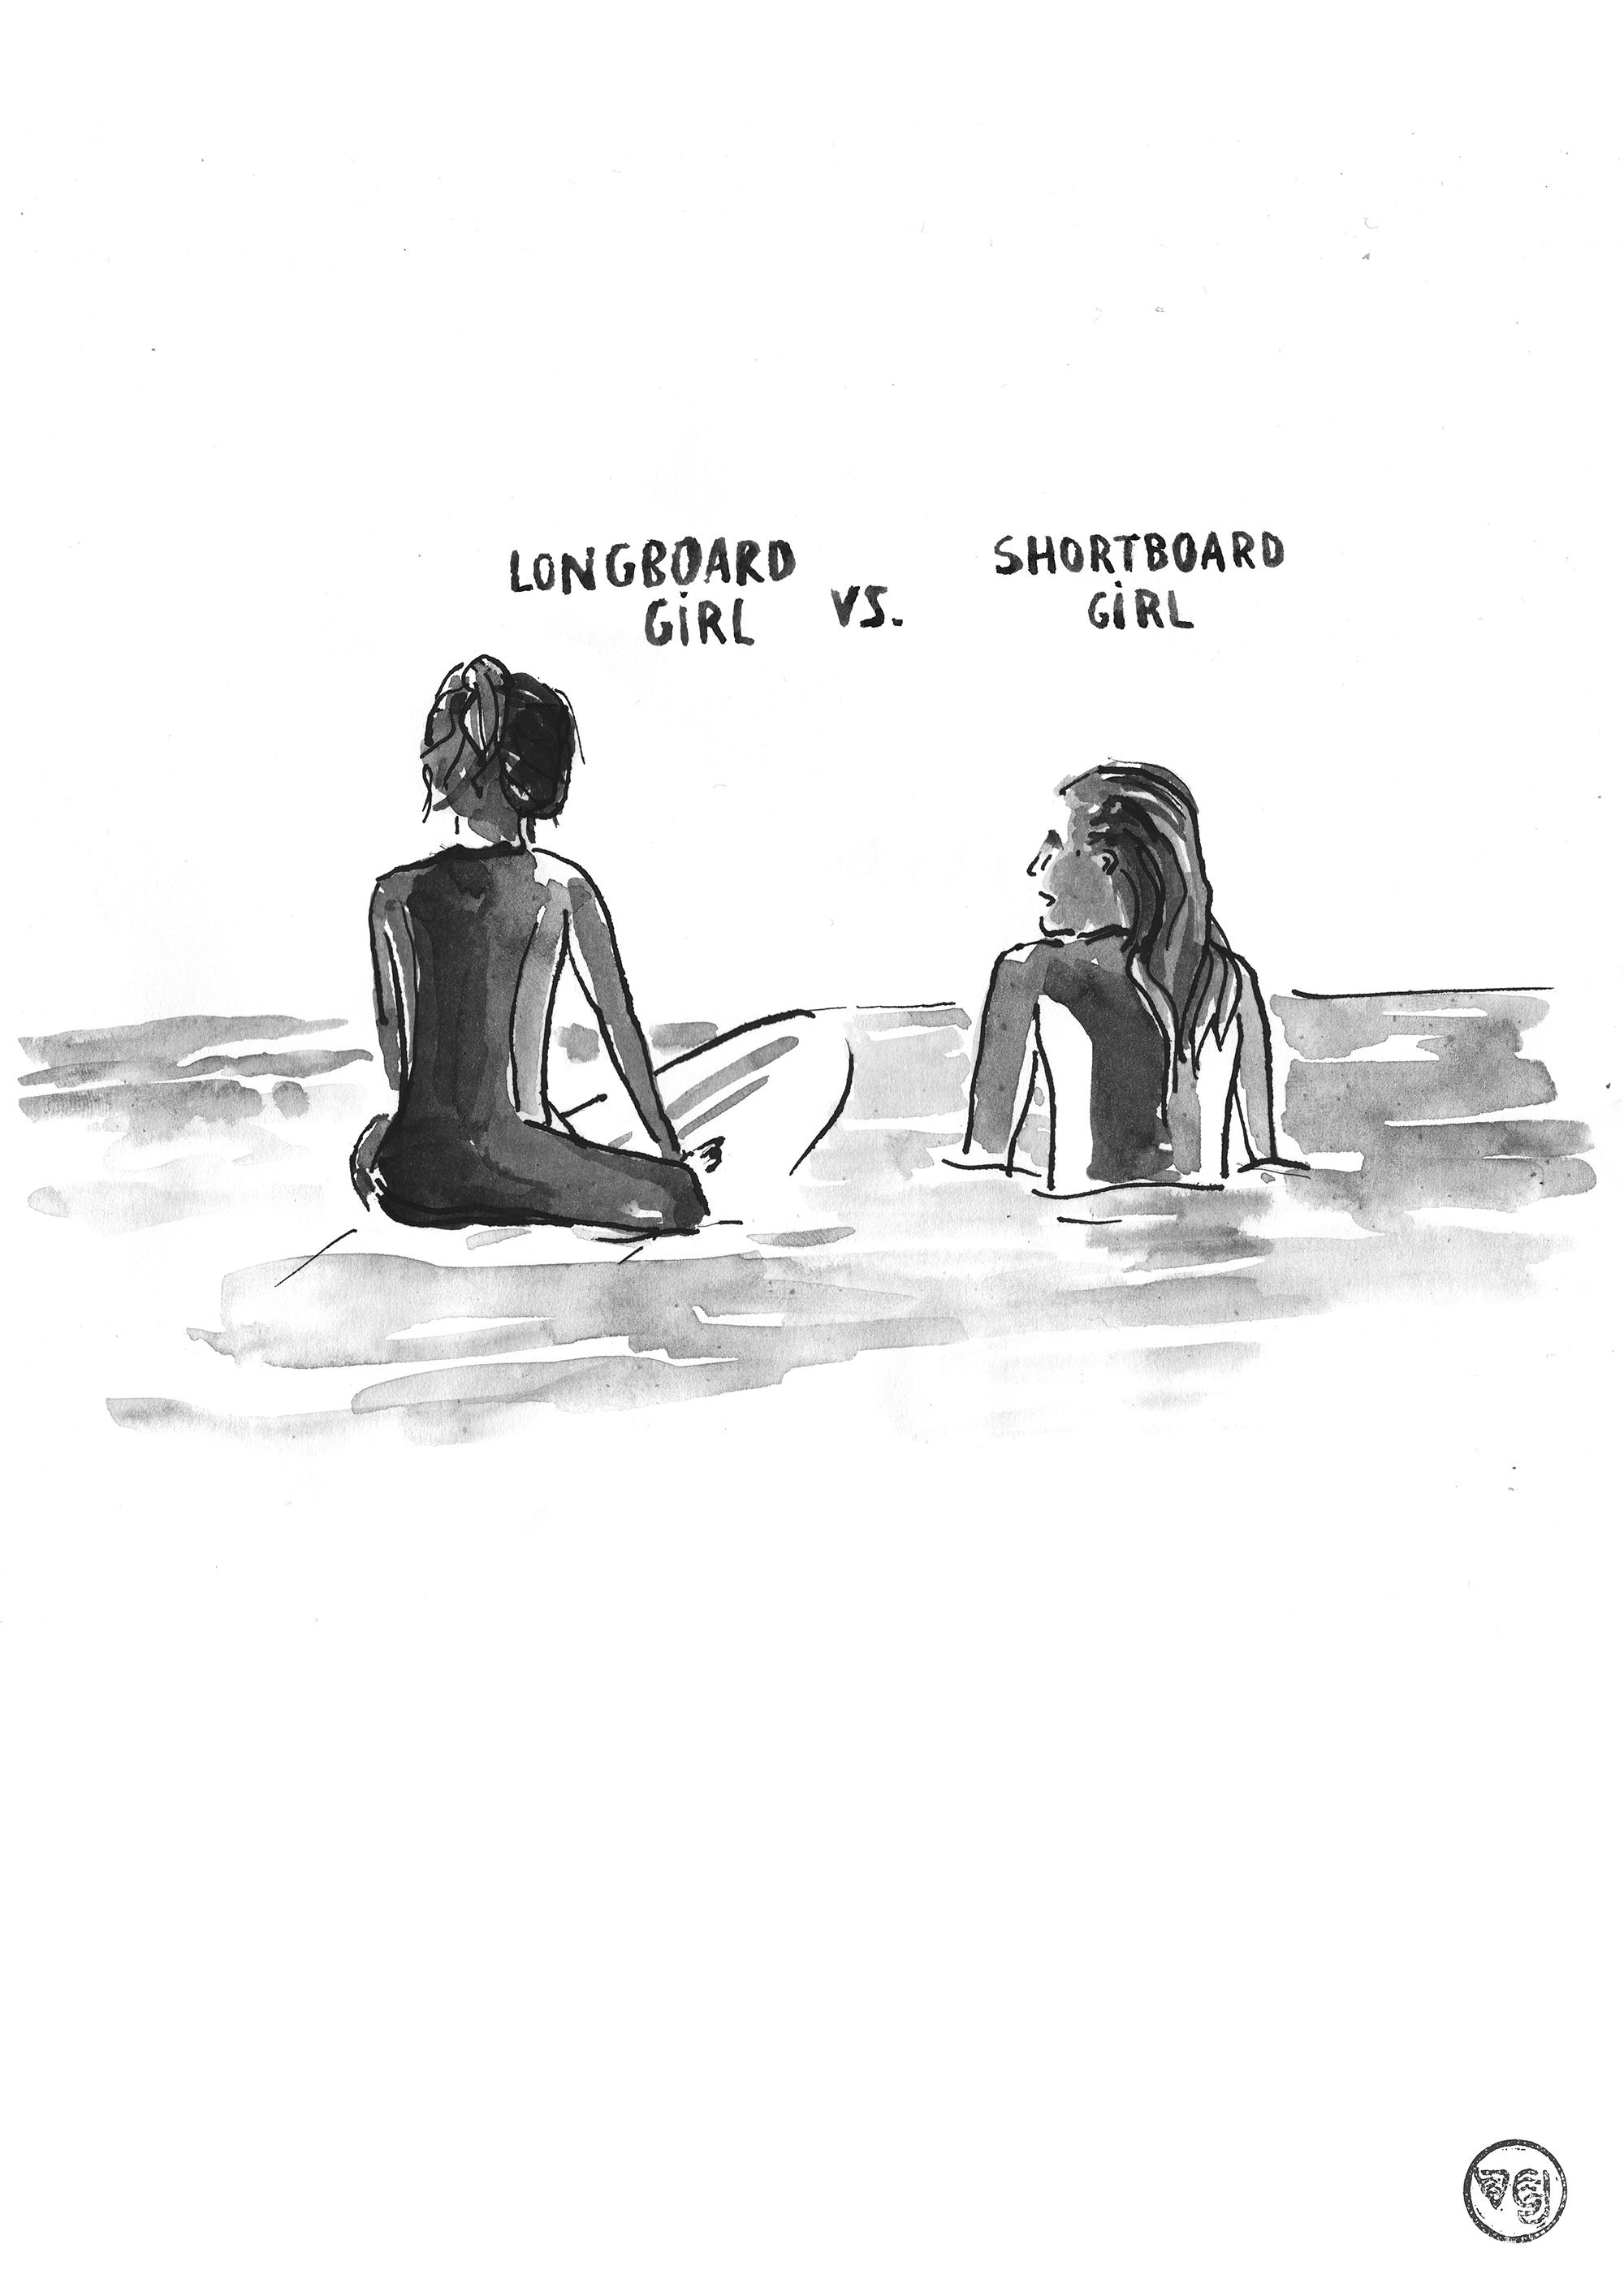 longboard-girl-vs-shortboard-girl-49x69-n&b